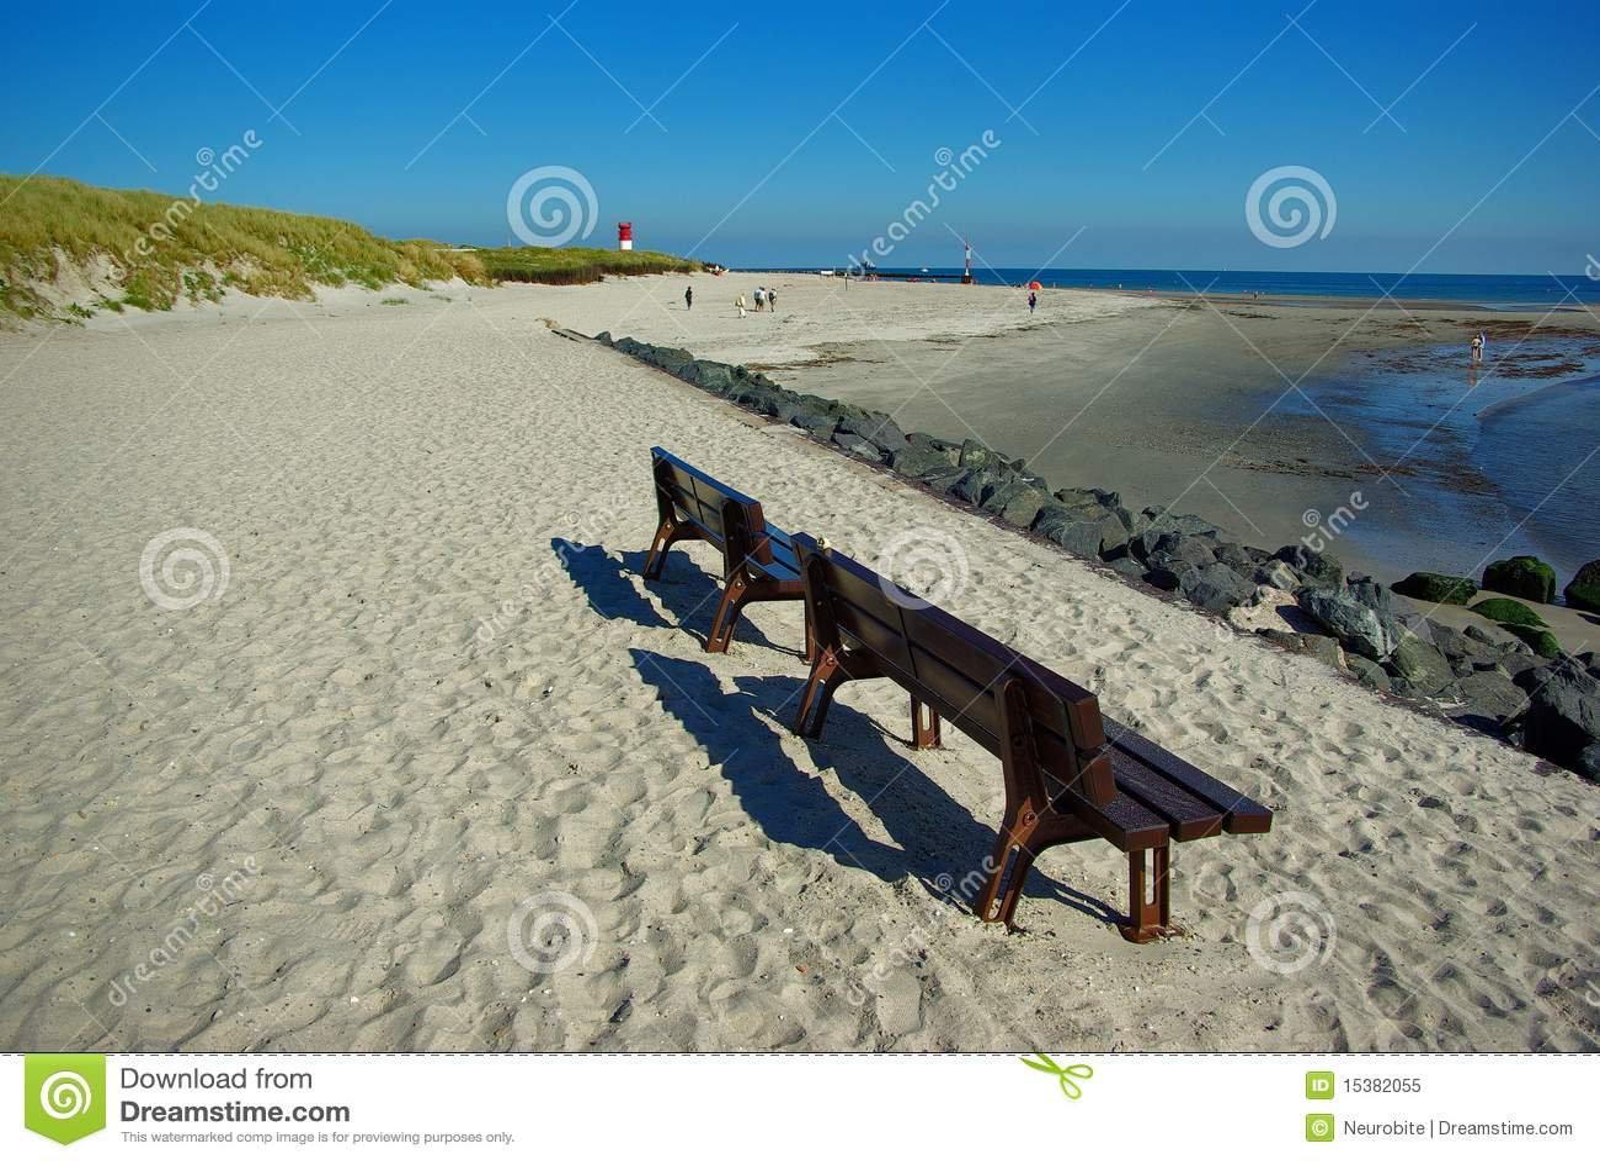 Helgoland island in germany beach on dune royalty free for Designhotel helgoland